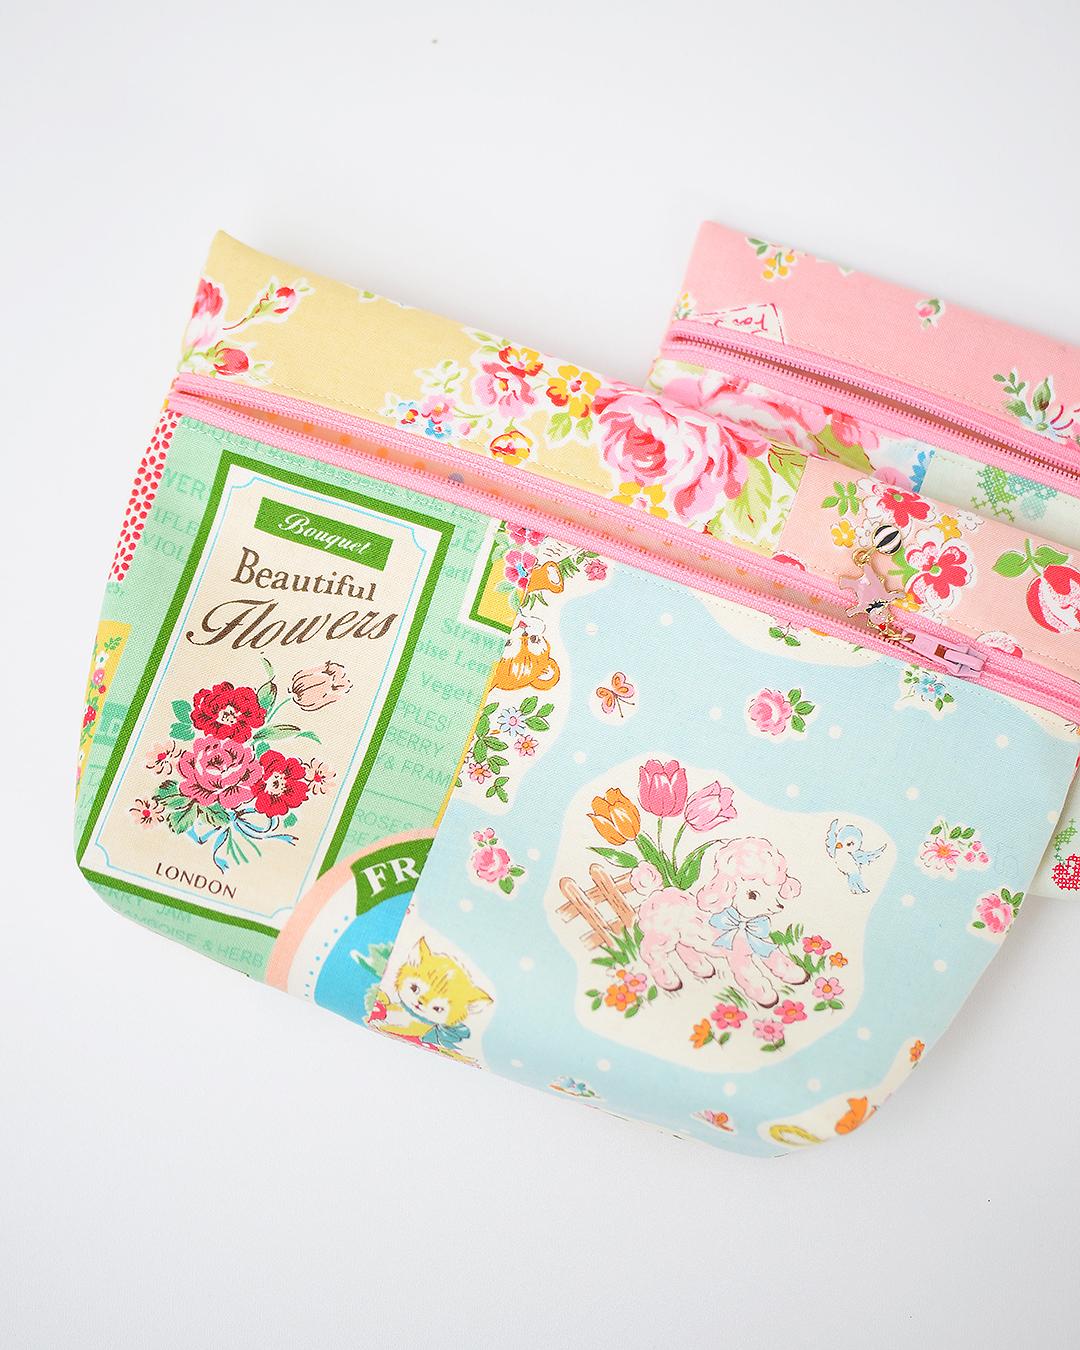 zipper pouch in two sizes